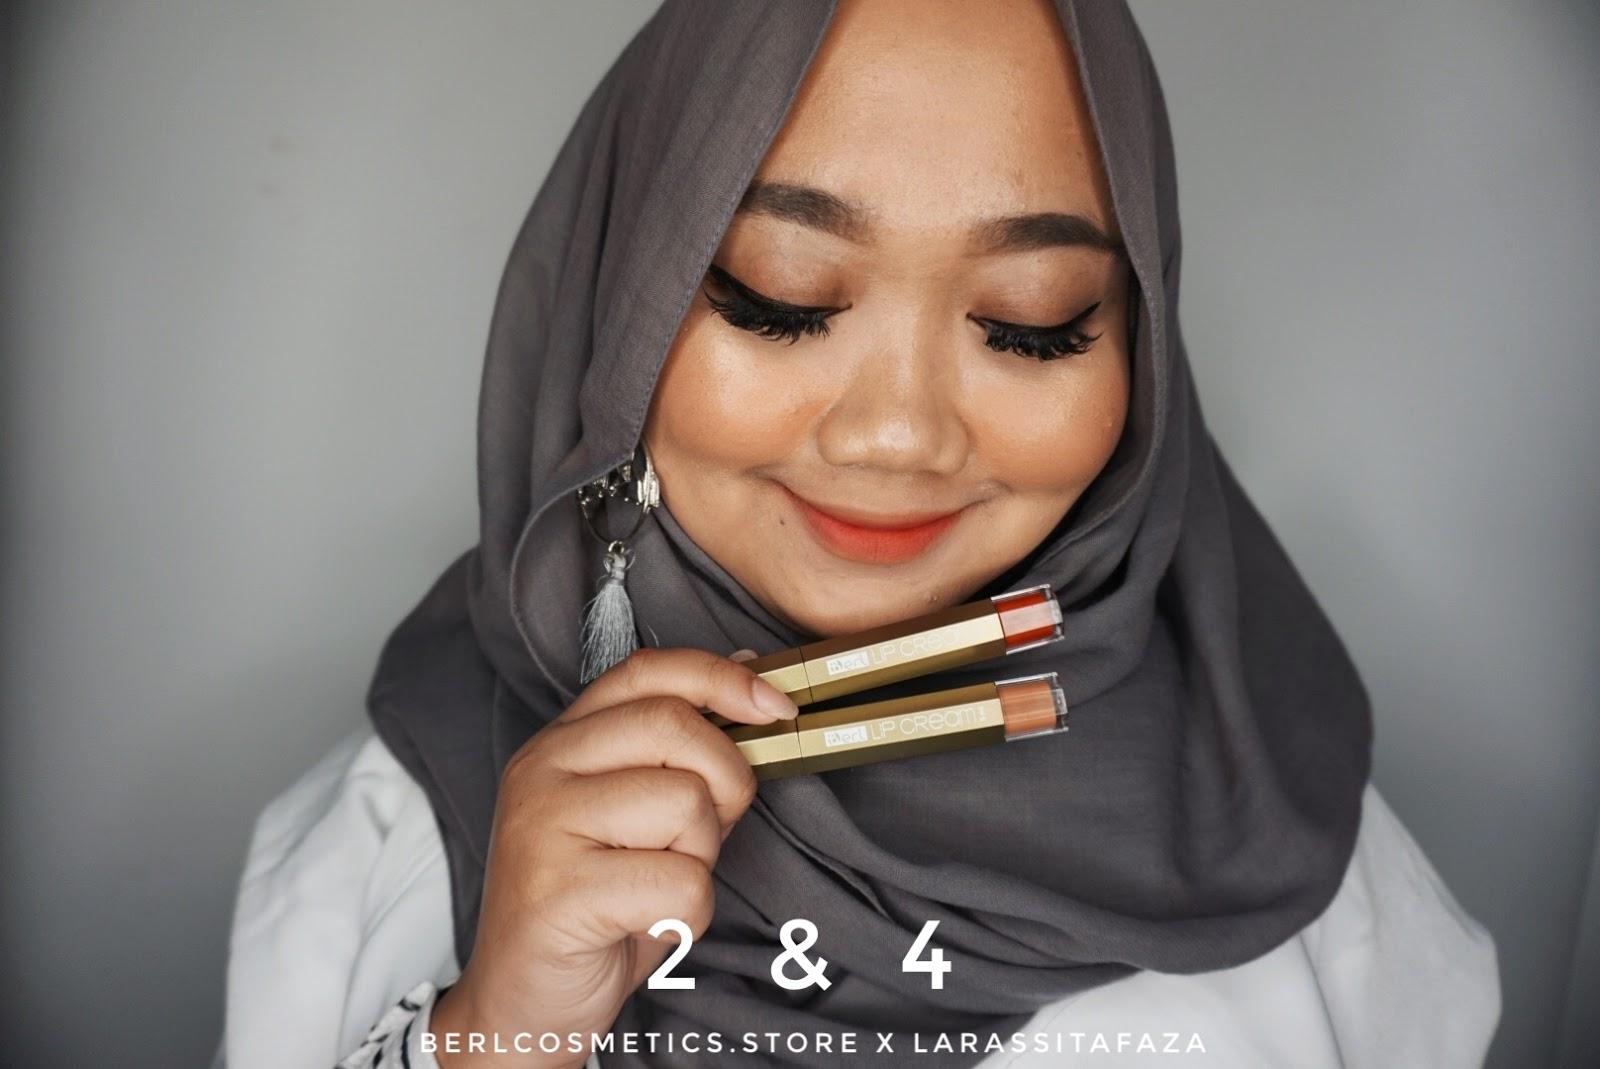 Review Produk B Erl Cosmetics Store Laras Sita Faza Matte Lip Cream Yang Aku Suka Dari Beauty Ini Ga Lengket Sama Sekali Dan Bikin Garis Bibir Keliatan Untuk Dijadiin Ombre Lips Pun Masalah